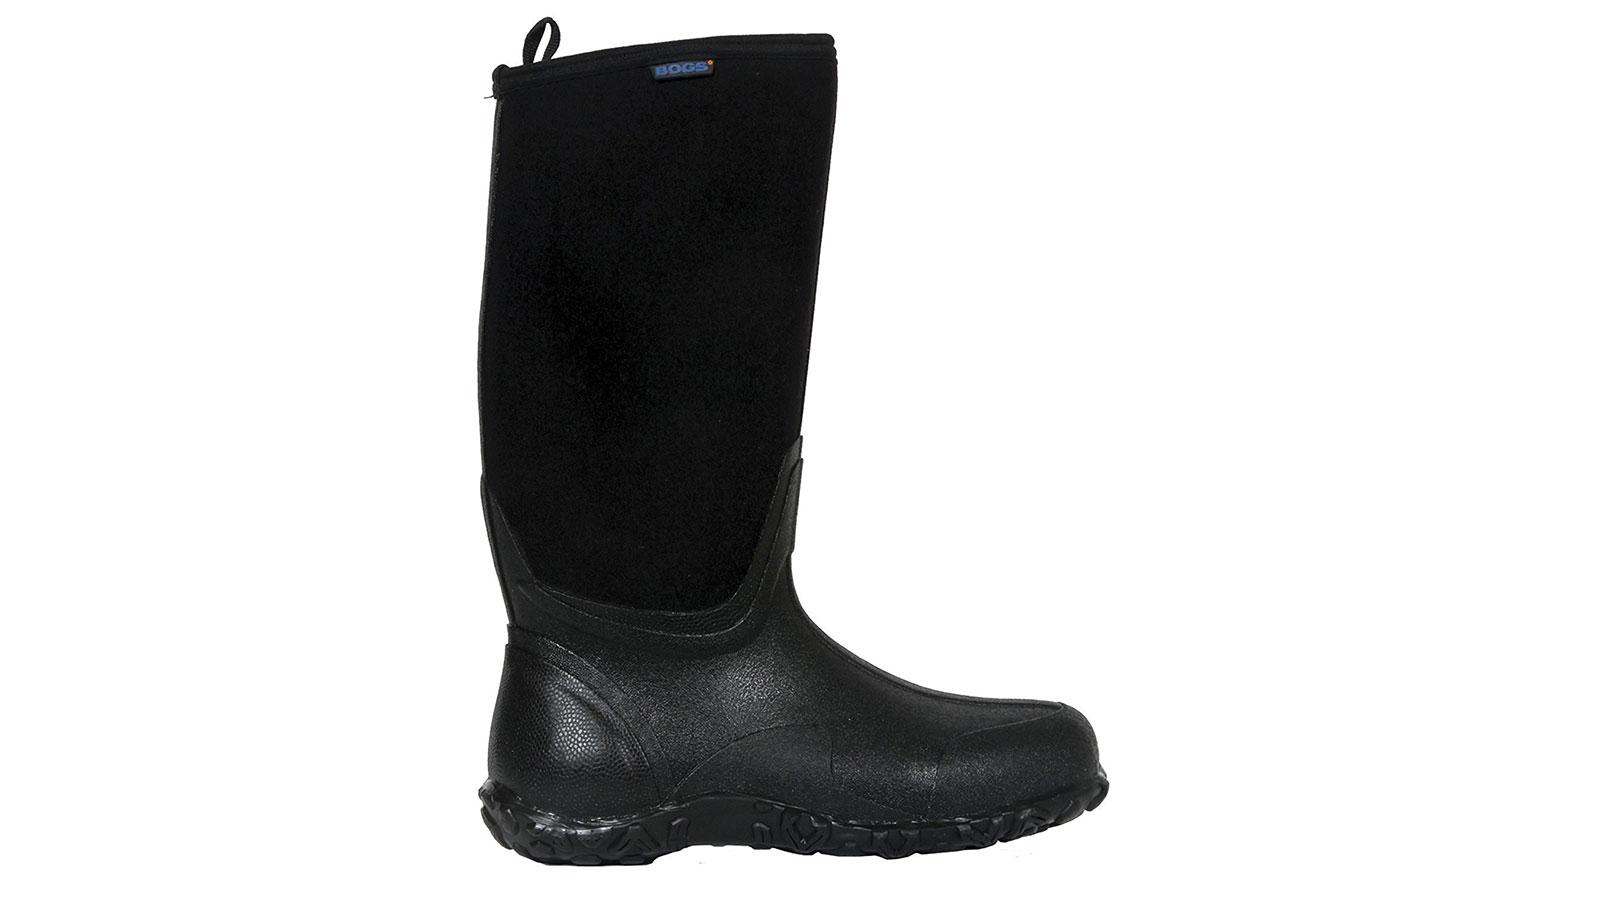 Bogs Classic High Men's Rain Boot | the best men's rain boots